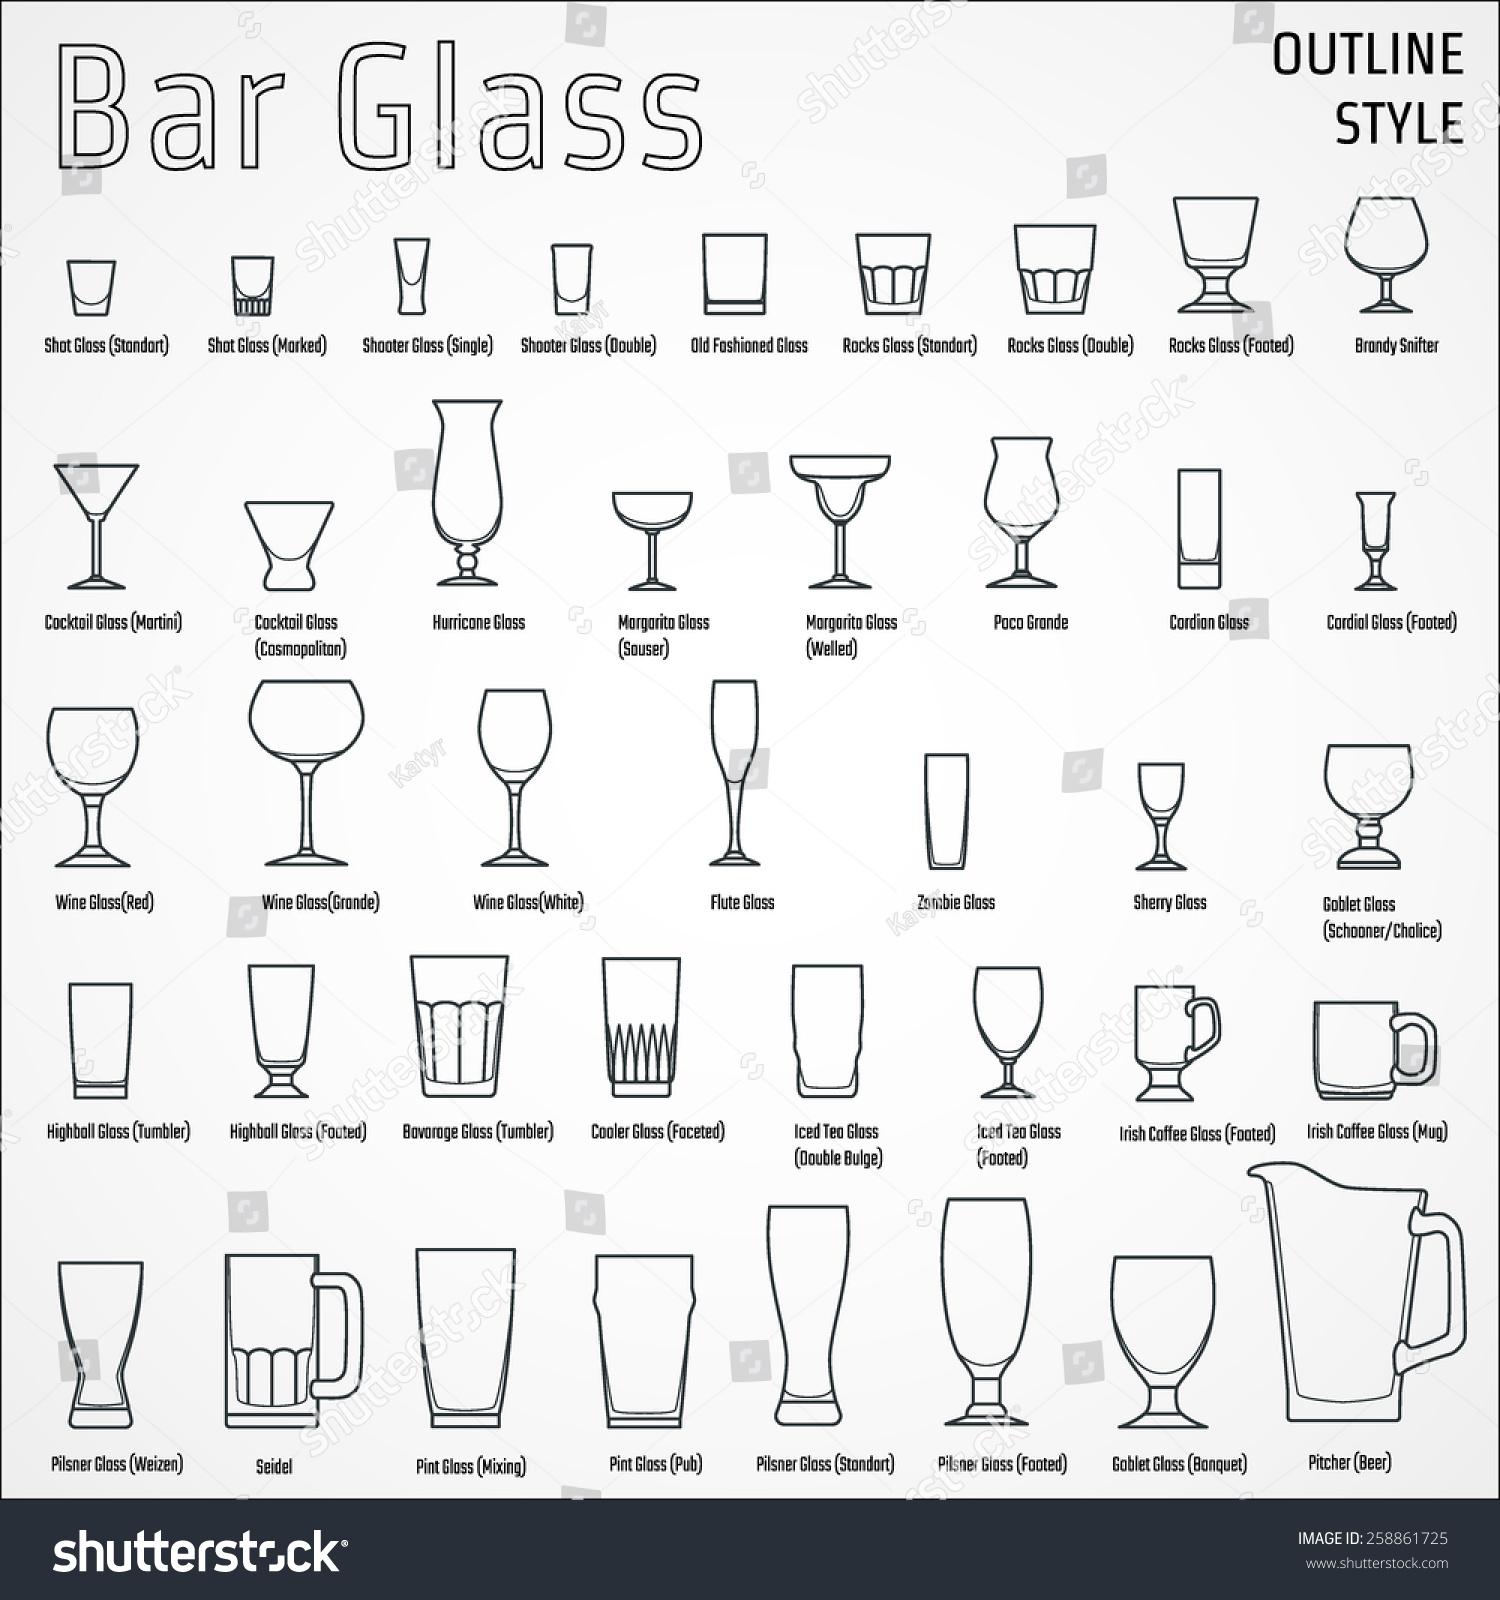 vector illustration outline silhouette set bar stock vector  - vector illustration of outline silhouette set of bar glass for designwebsite background